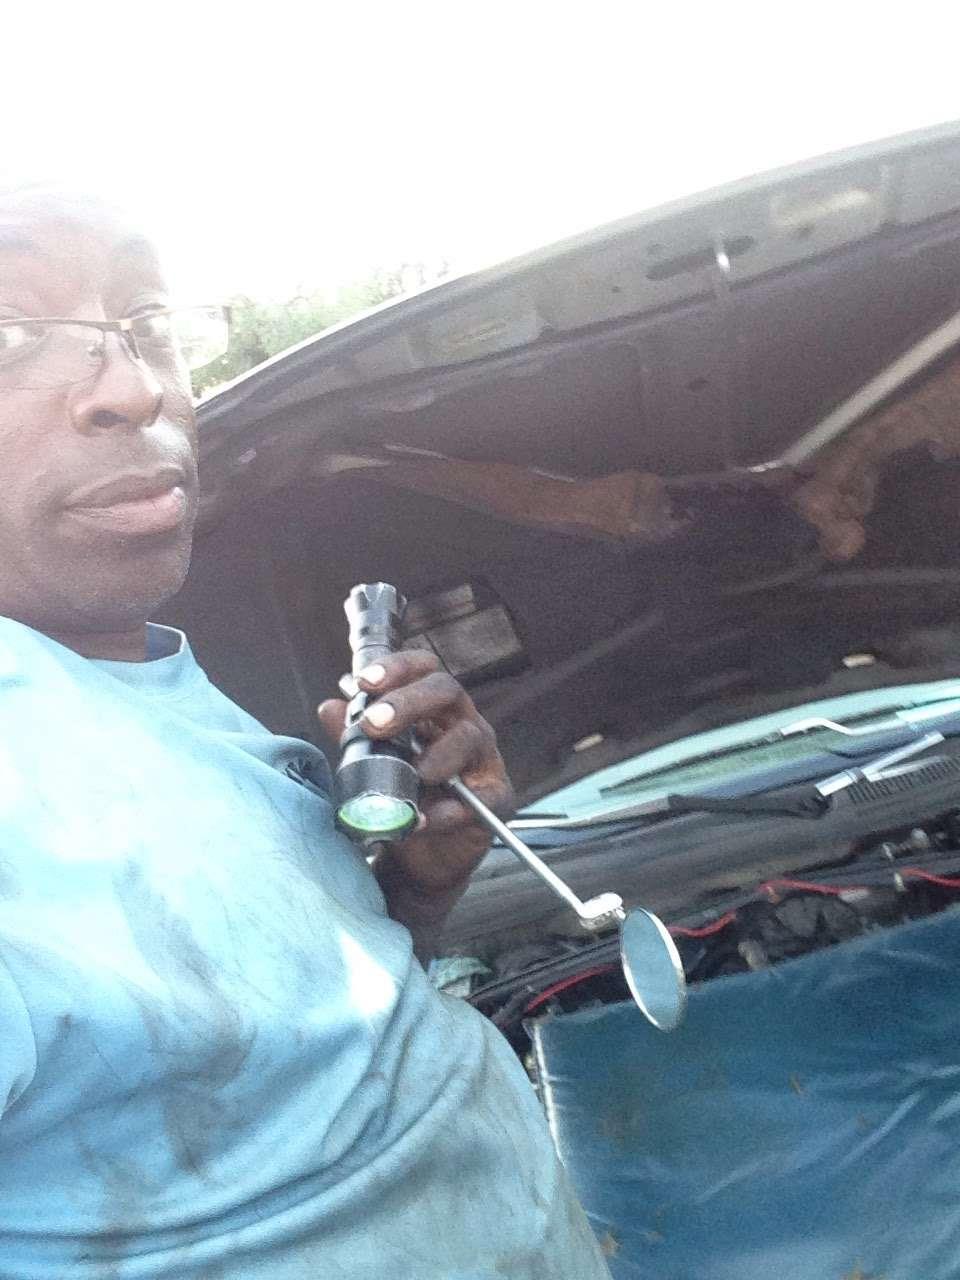 Kevins Mobile Auto Service - car repair    Photo 3 of 10   Address: 1112 Cobblestone Cir, Kissimmee, FL 34744, USA   Phone: (252) 468-6950